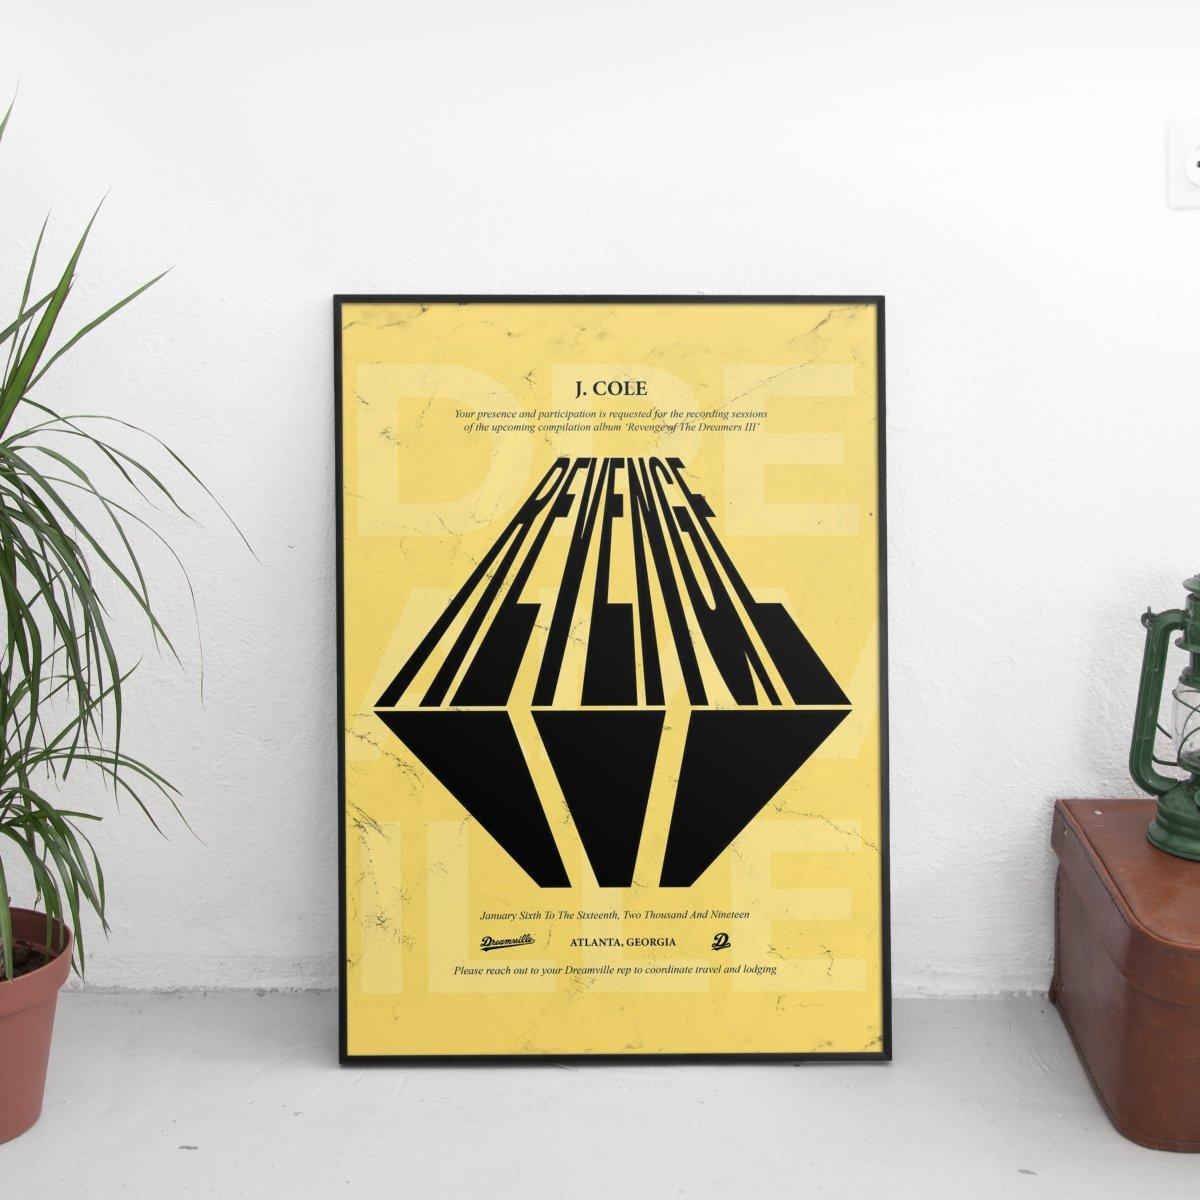 J. Cole - Revenge Poster